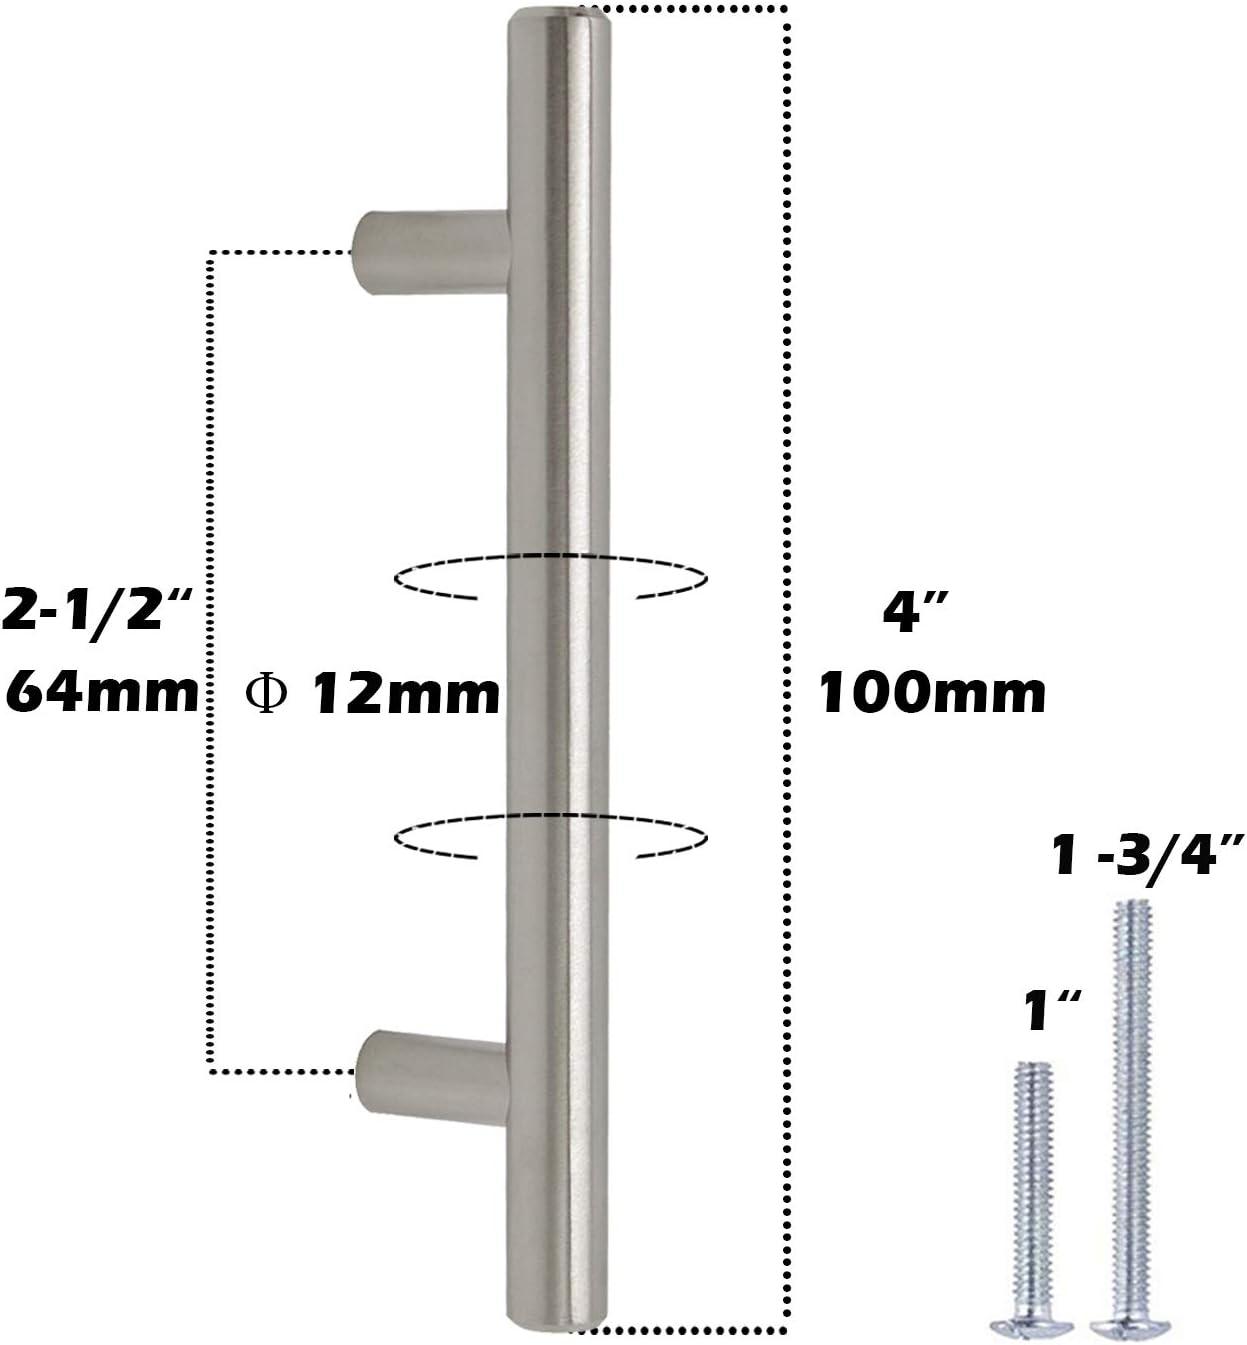 Gobrico GB201HSS64 Satin Nickle 64mm Cabinet Pull Handle for Furniture Drawer Cupboard Dresser T-bar 10 Pack